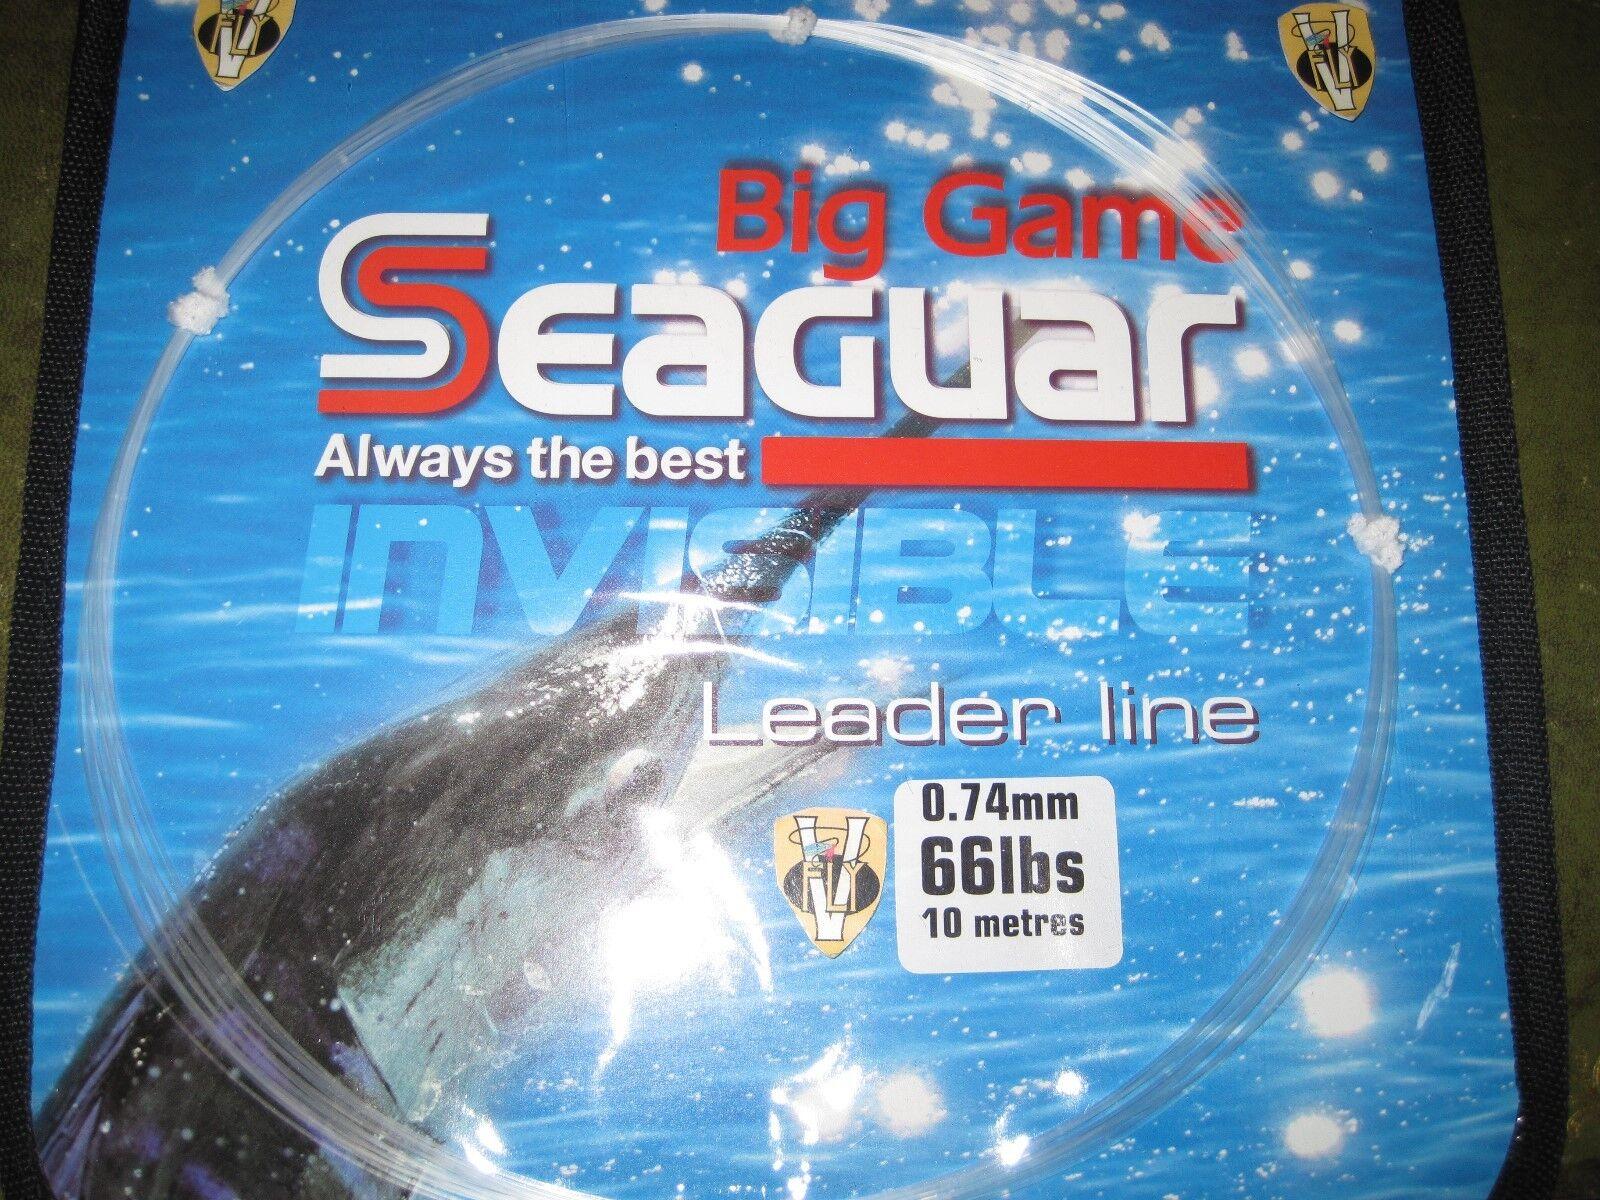 Seaguar Ace Hard Flugoldcarbon Big Game  Leader Line 66 to 250Lbs Coils  up to 50% off